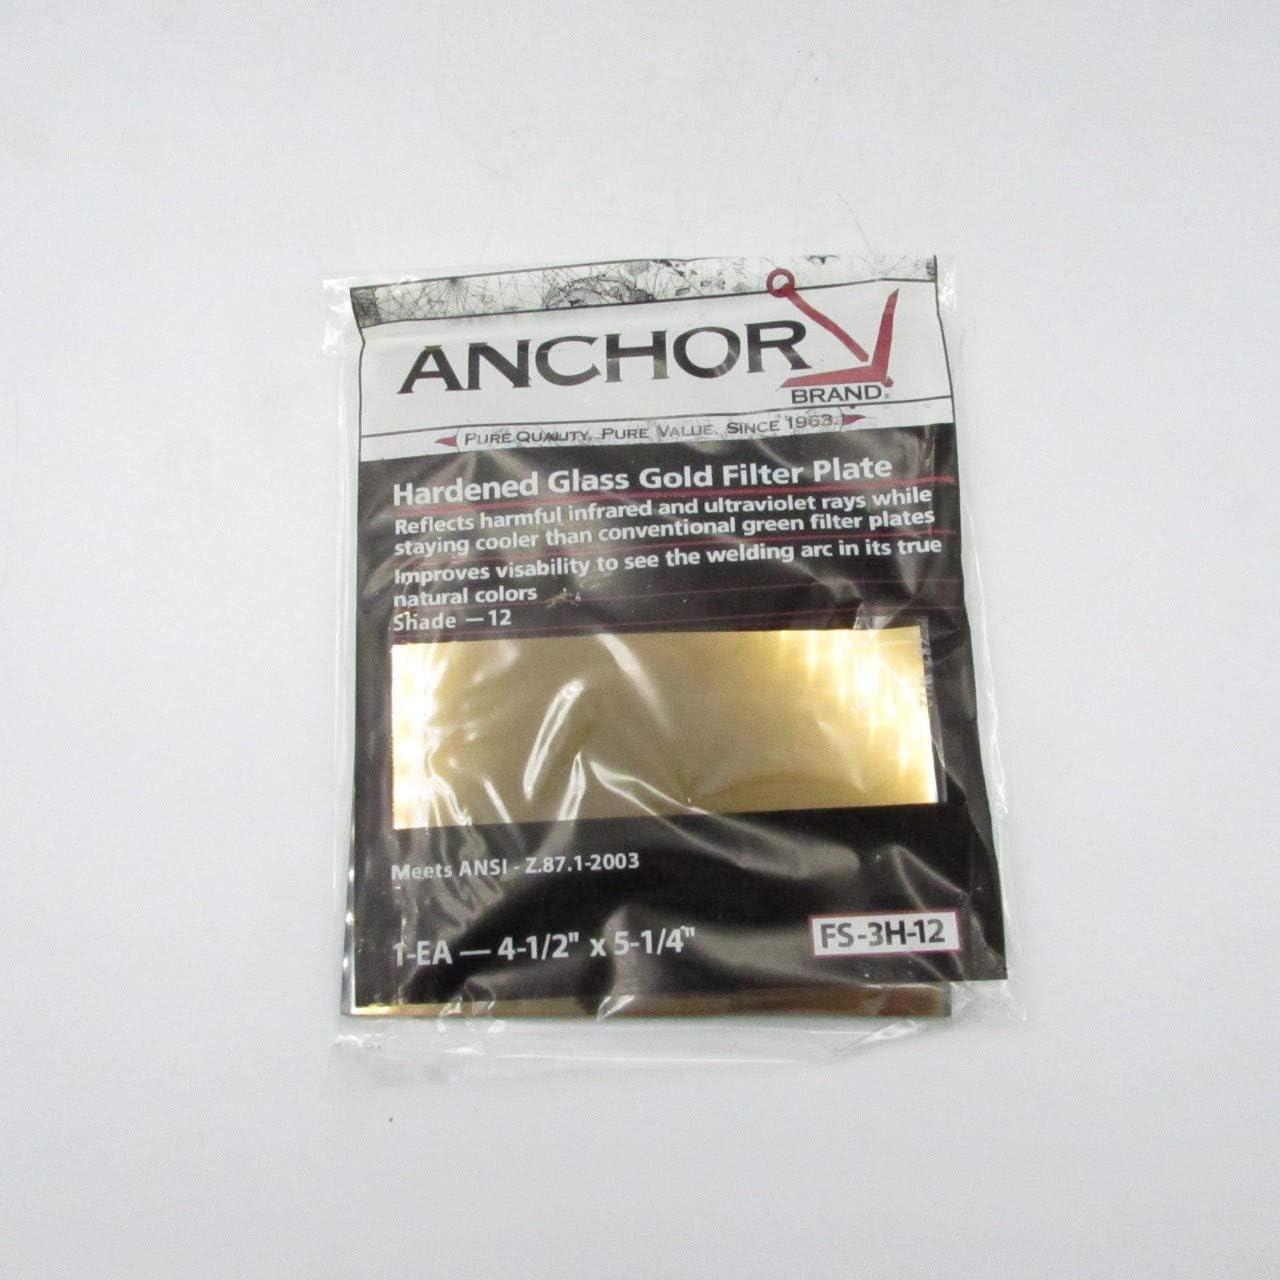 Anchor 1 year warranty Brand 101-FS-3H-12 Fs-3H-12 4X5 Spasm price Goldfilter Plate